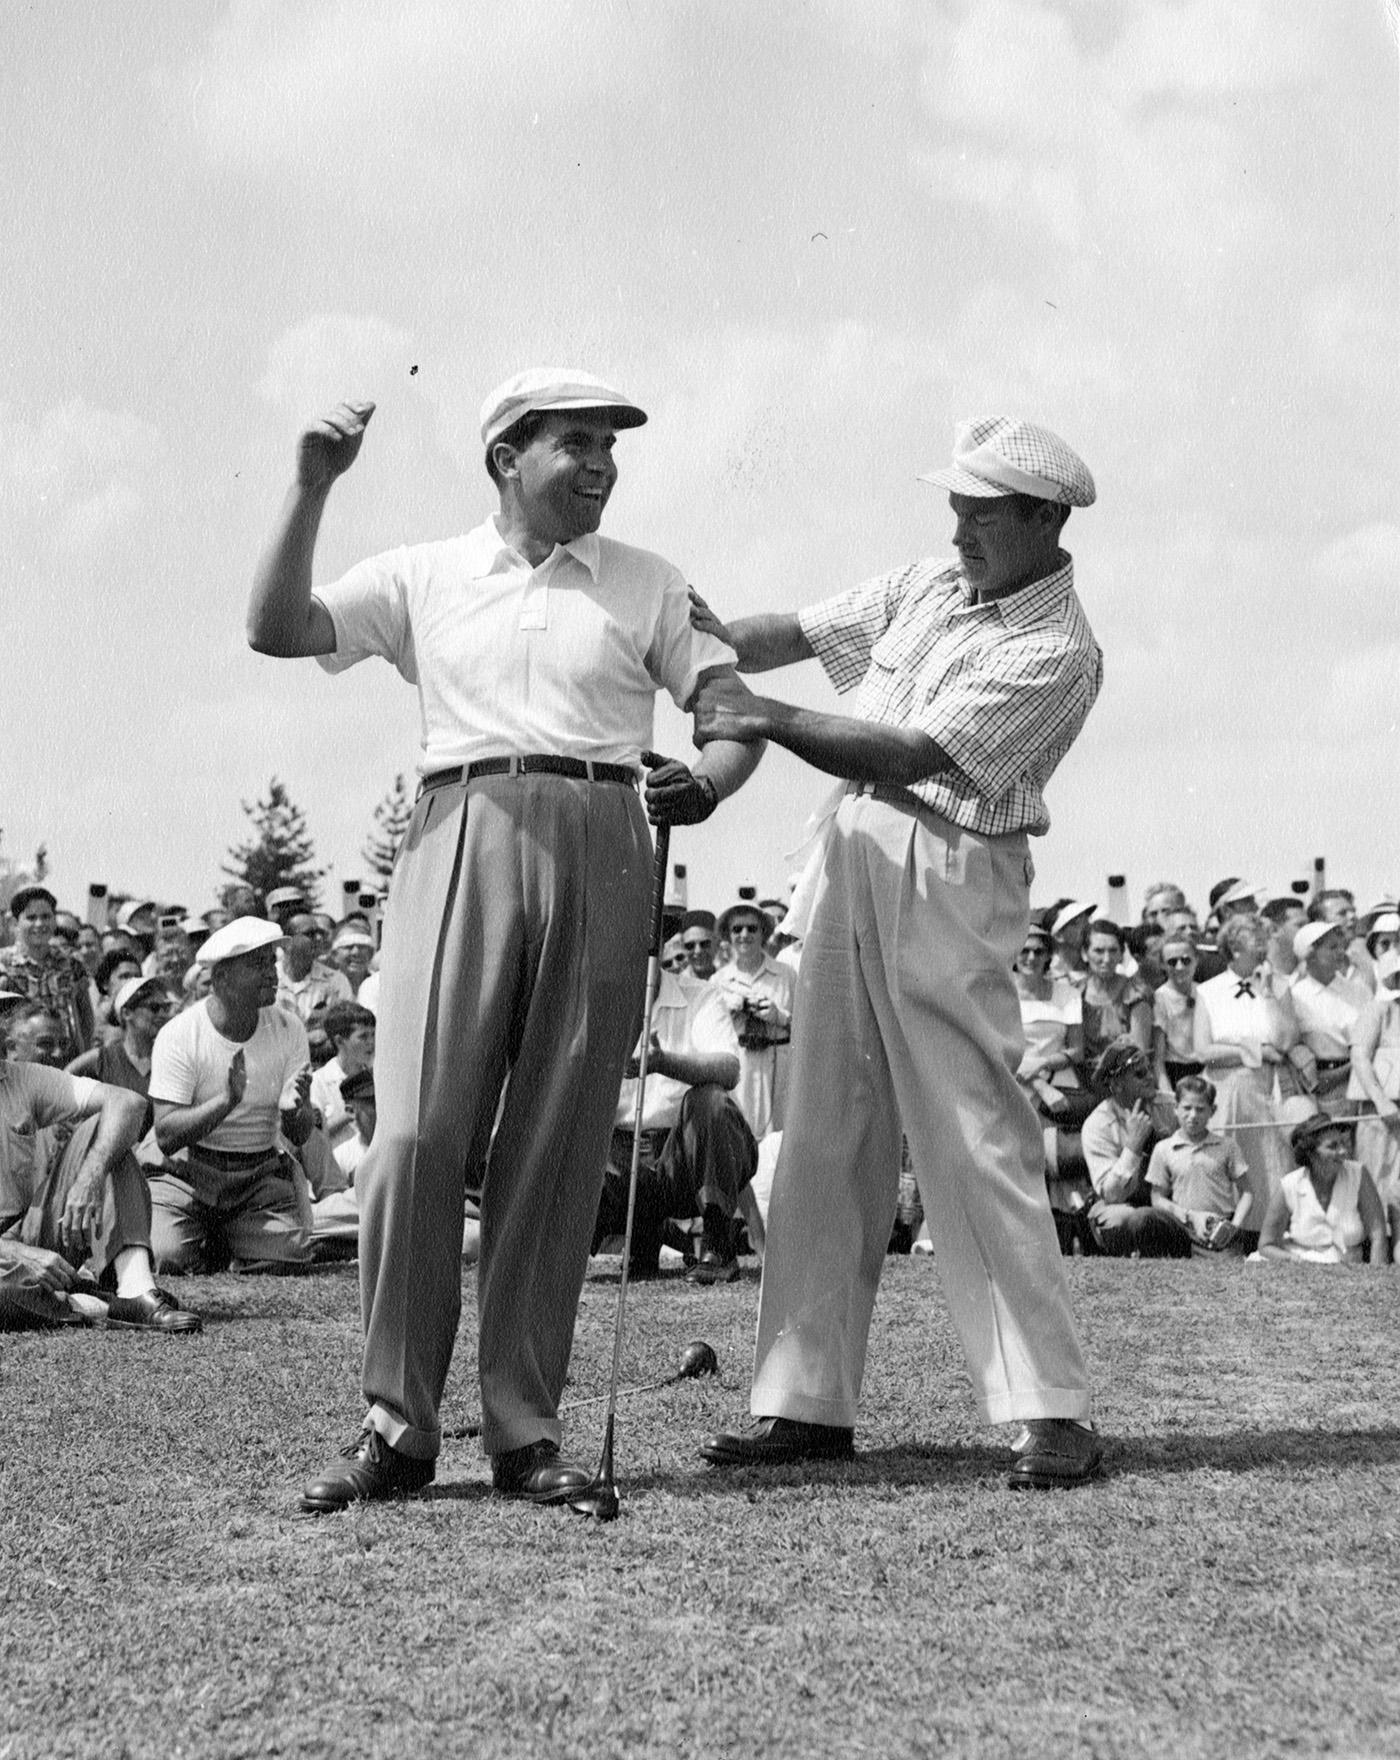 Richard Nixon Bob Hope golf again